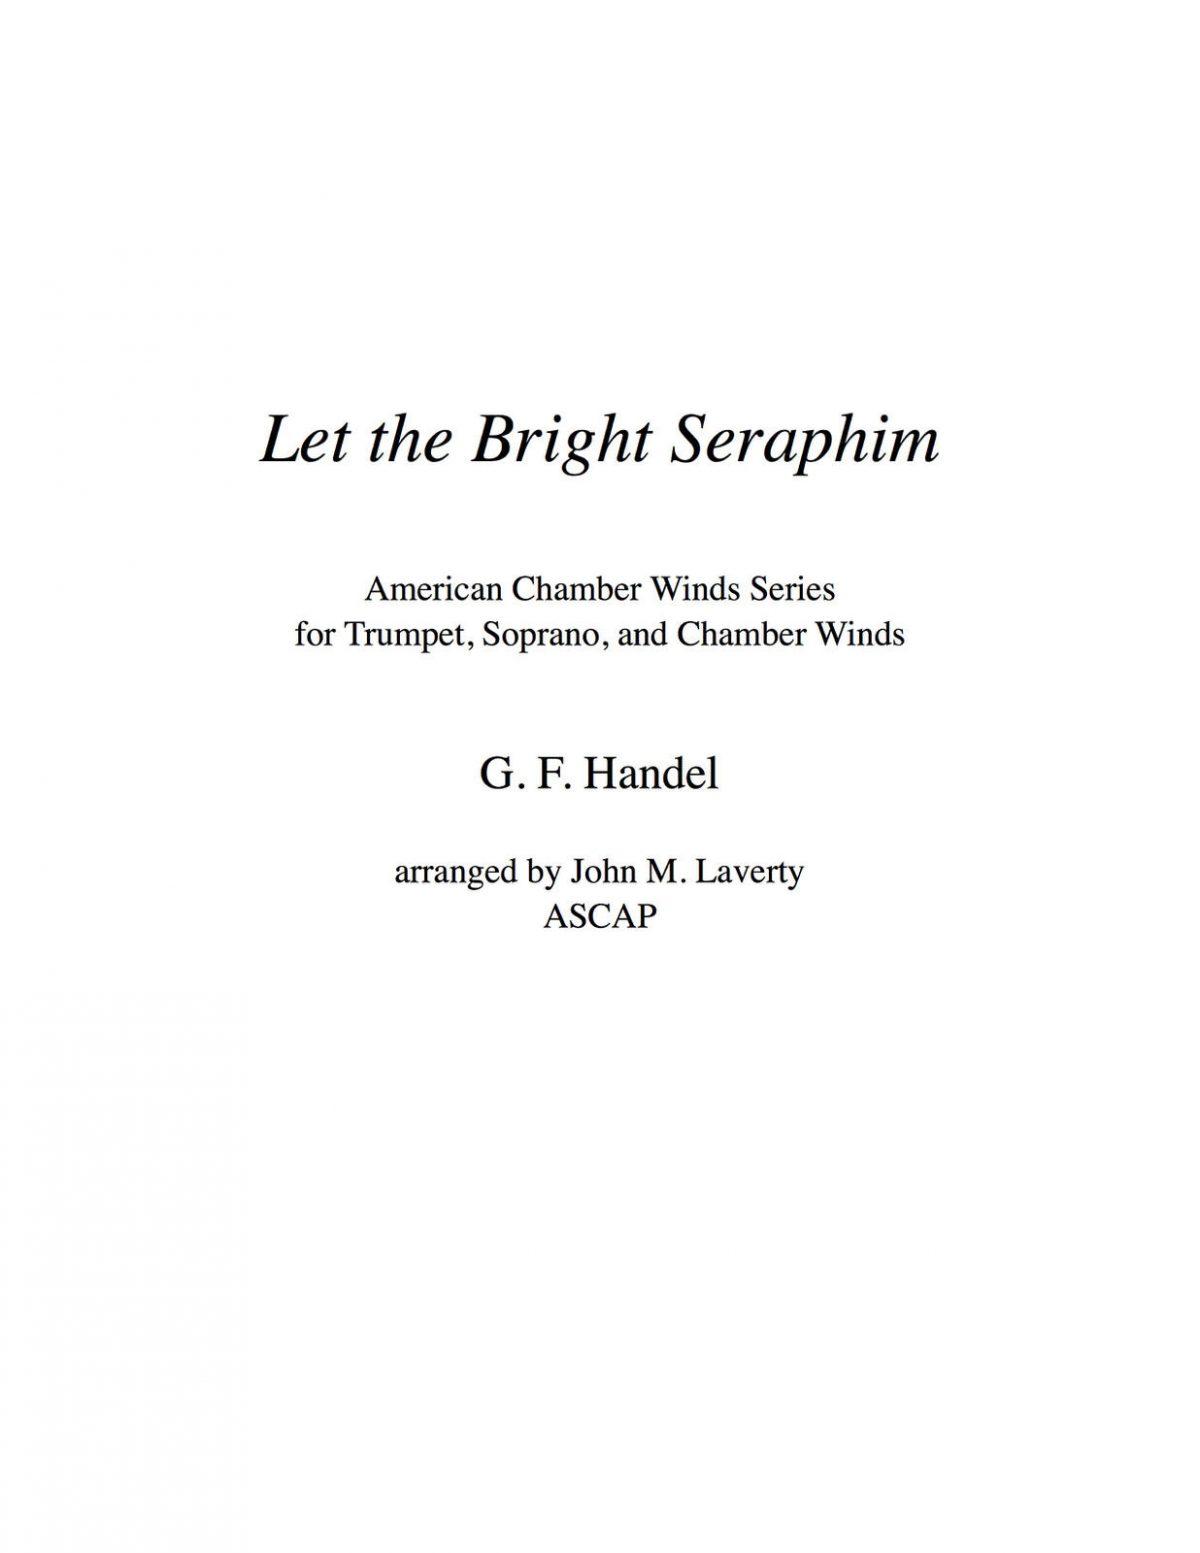 Handel, Let the Bright Seraphim Winds 5